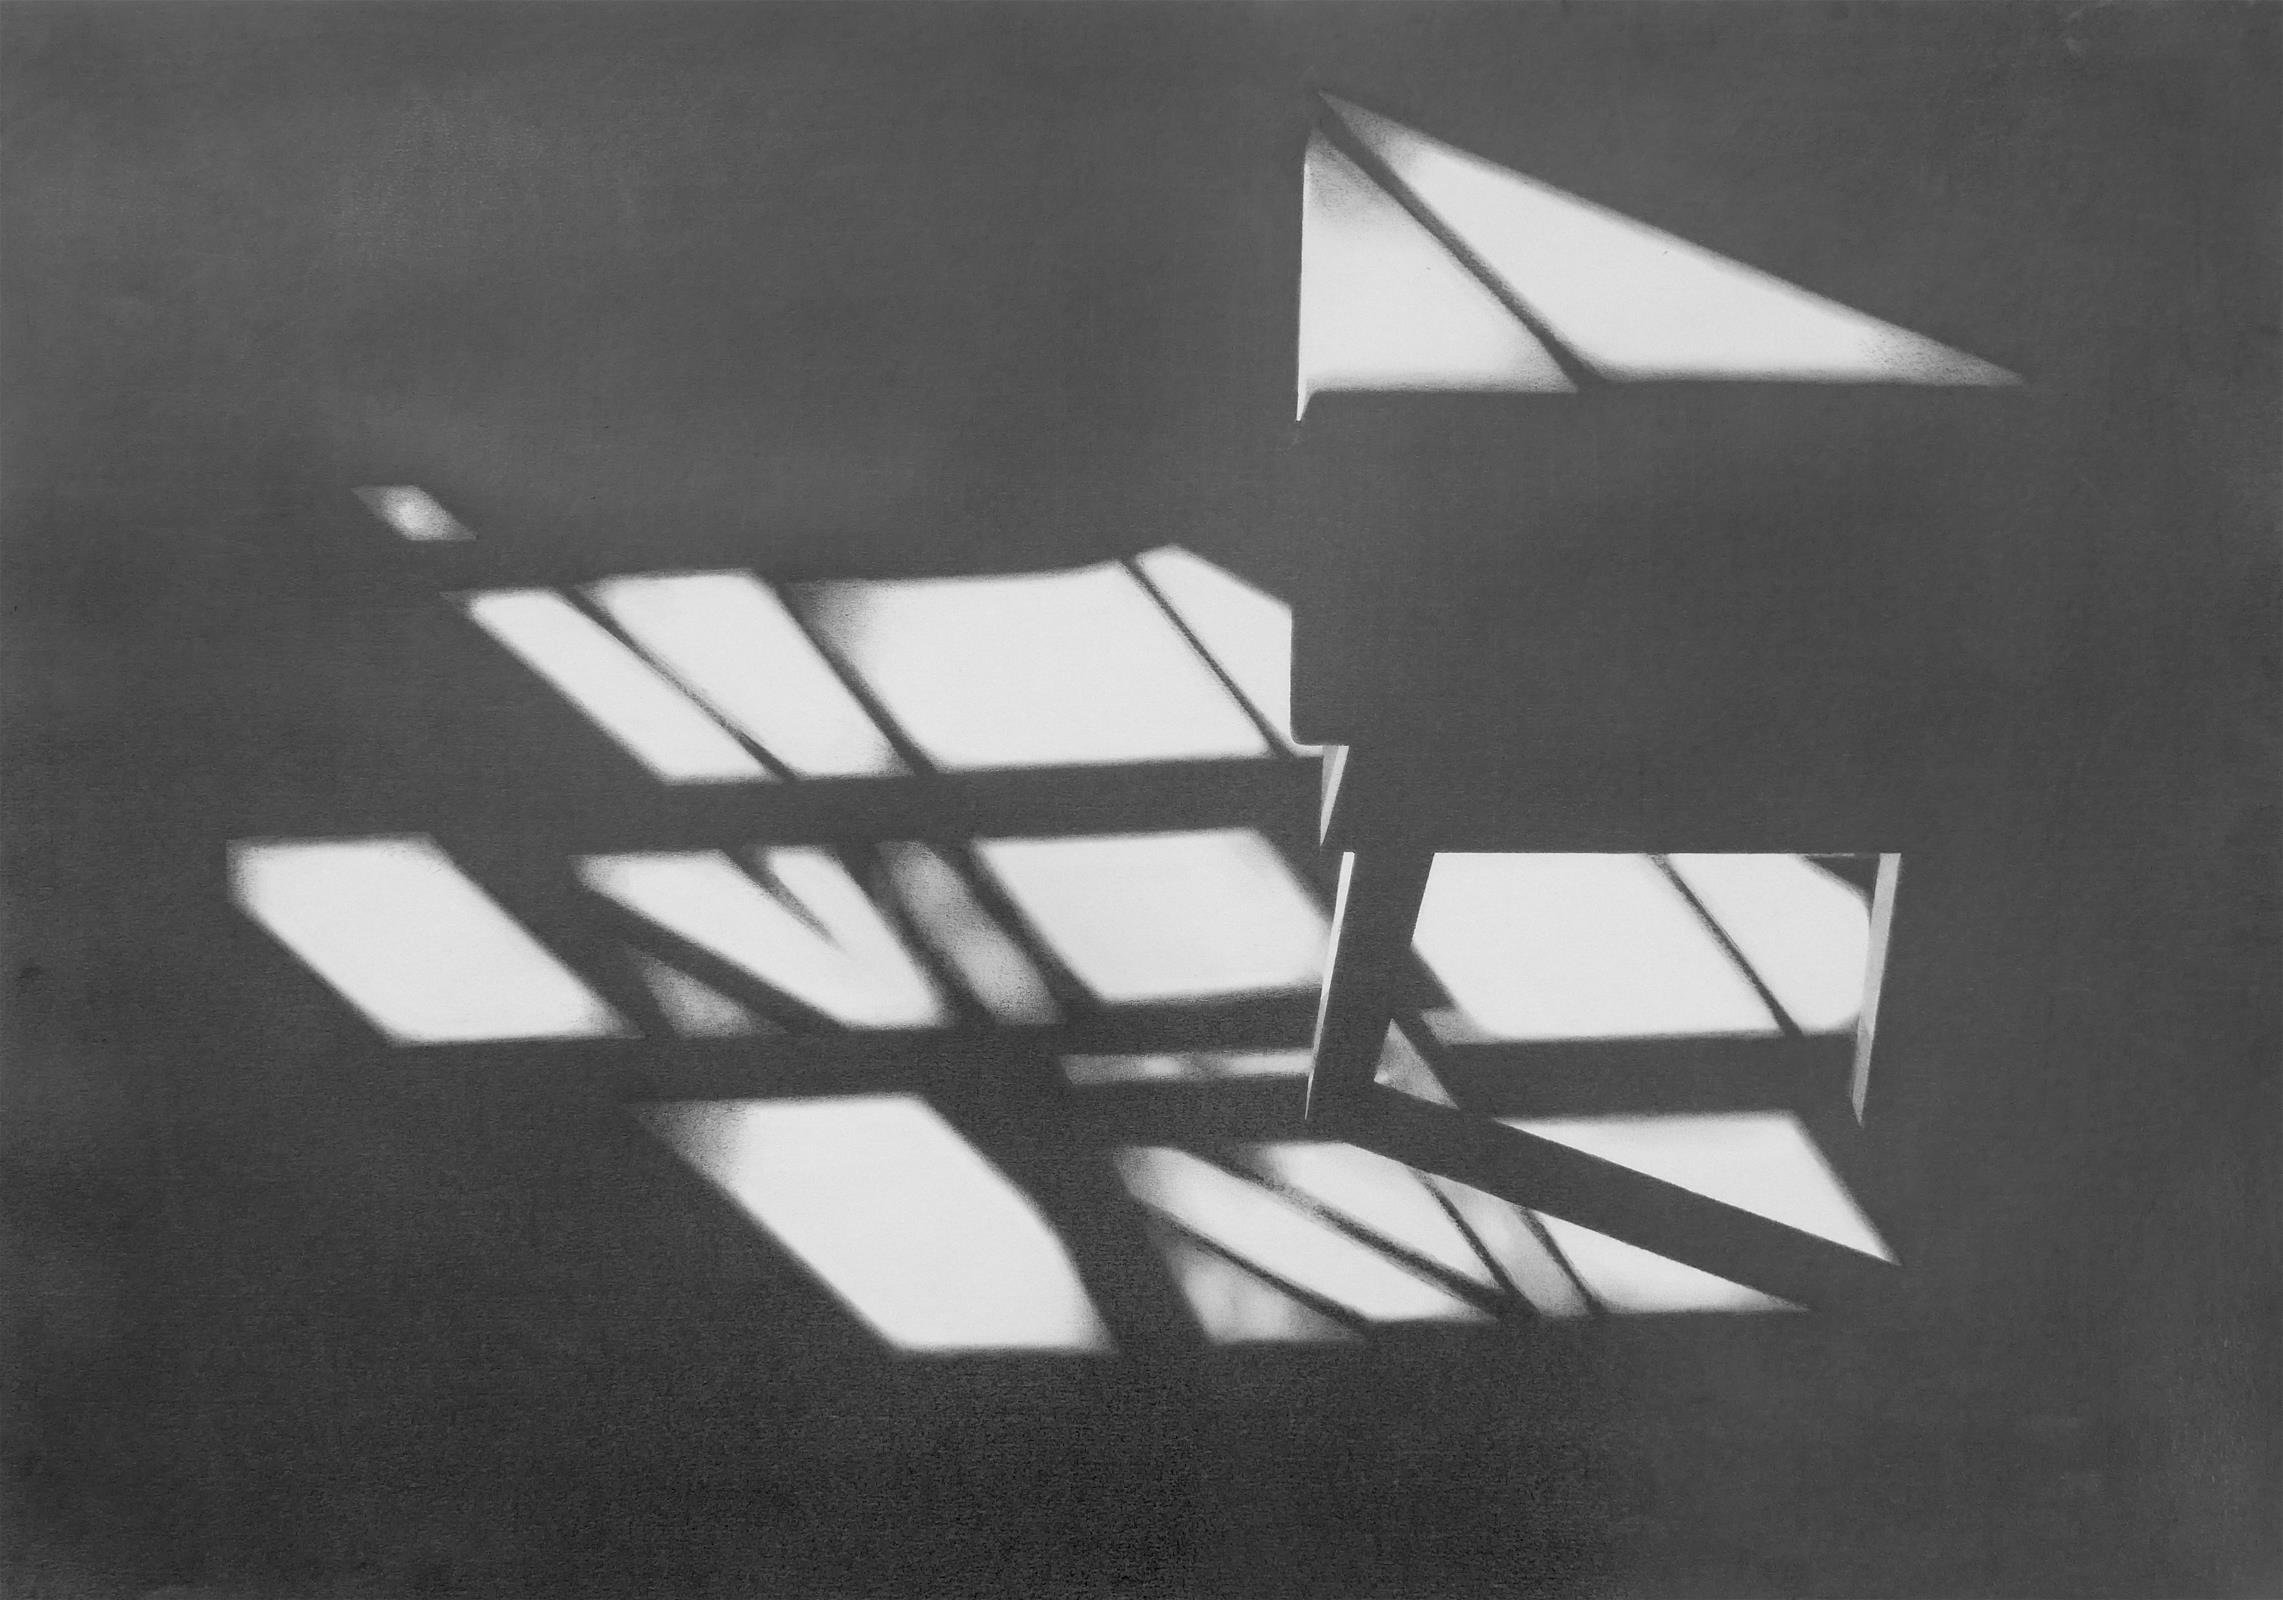 Untitled (Window shadow)